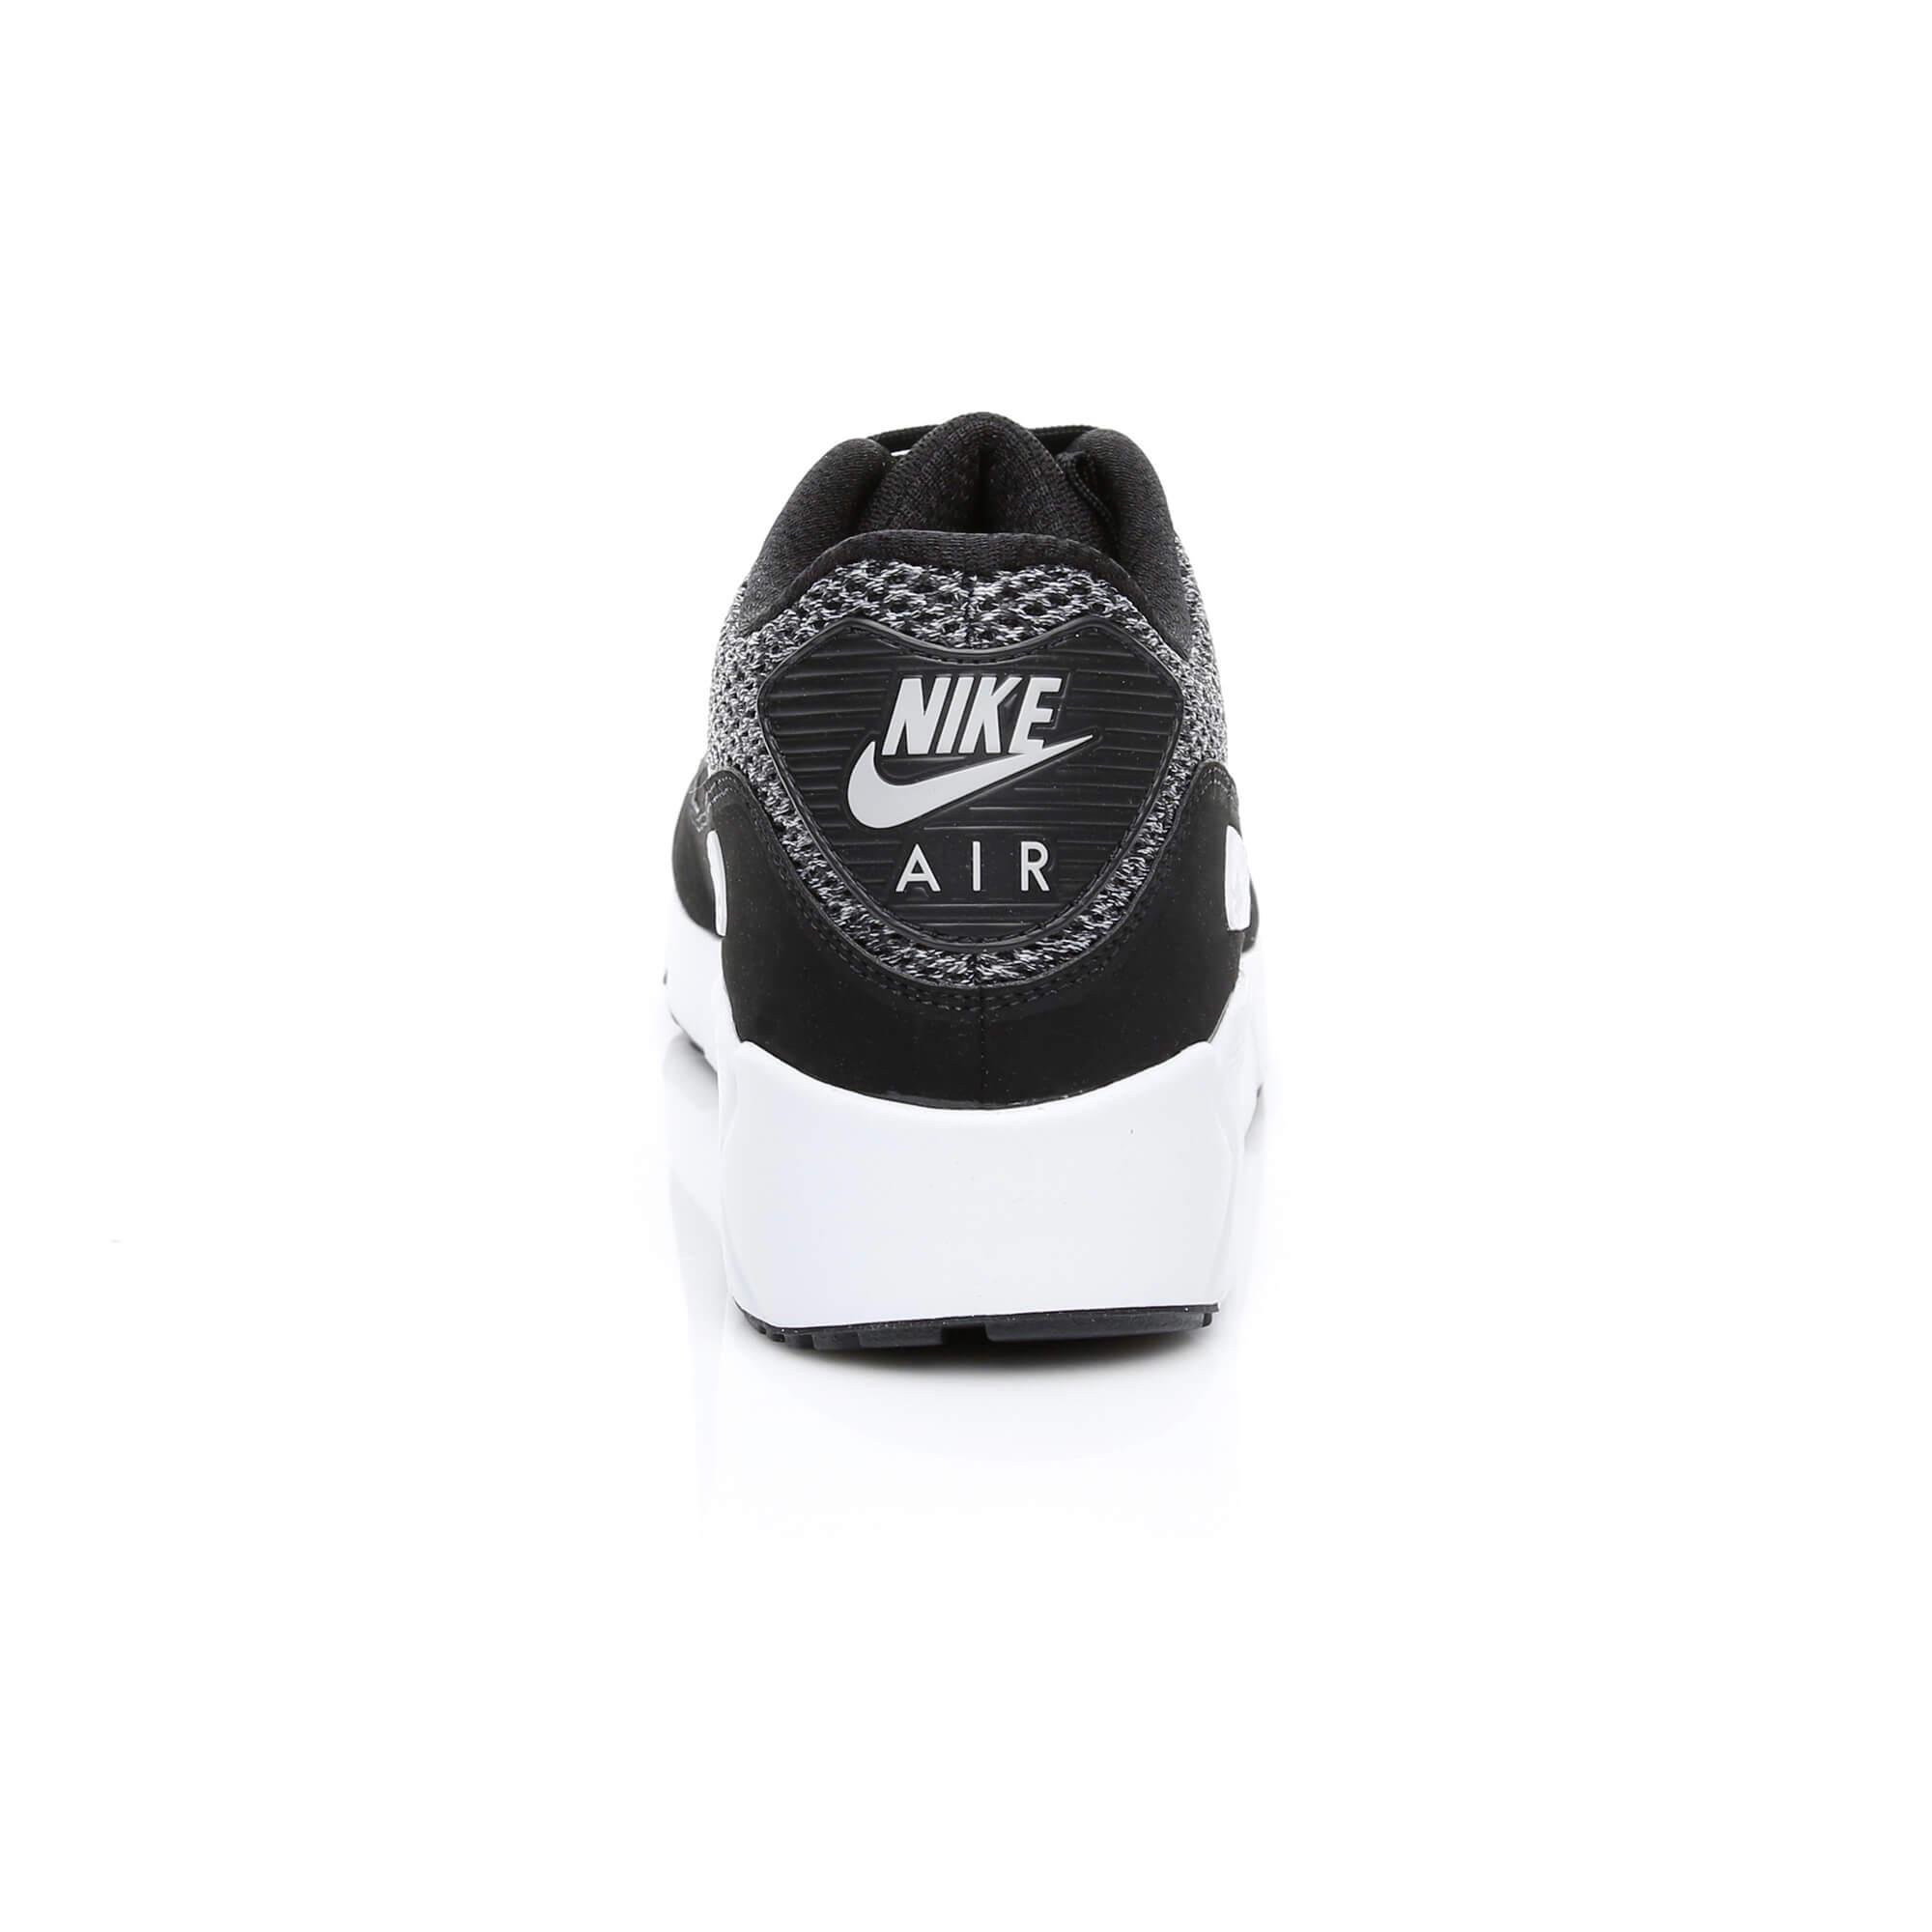 Nike Air Max 90 Ultra 2.0 Essential Erkek Siyah Spor Ayakkabi